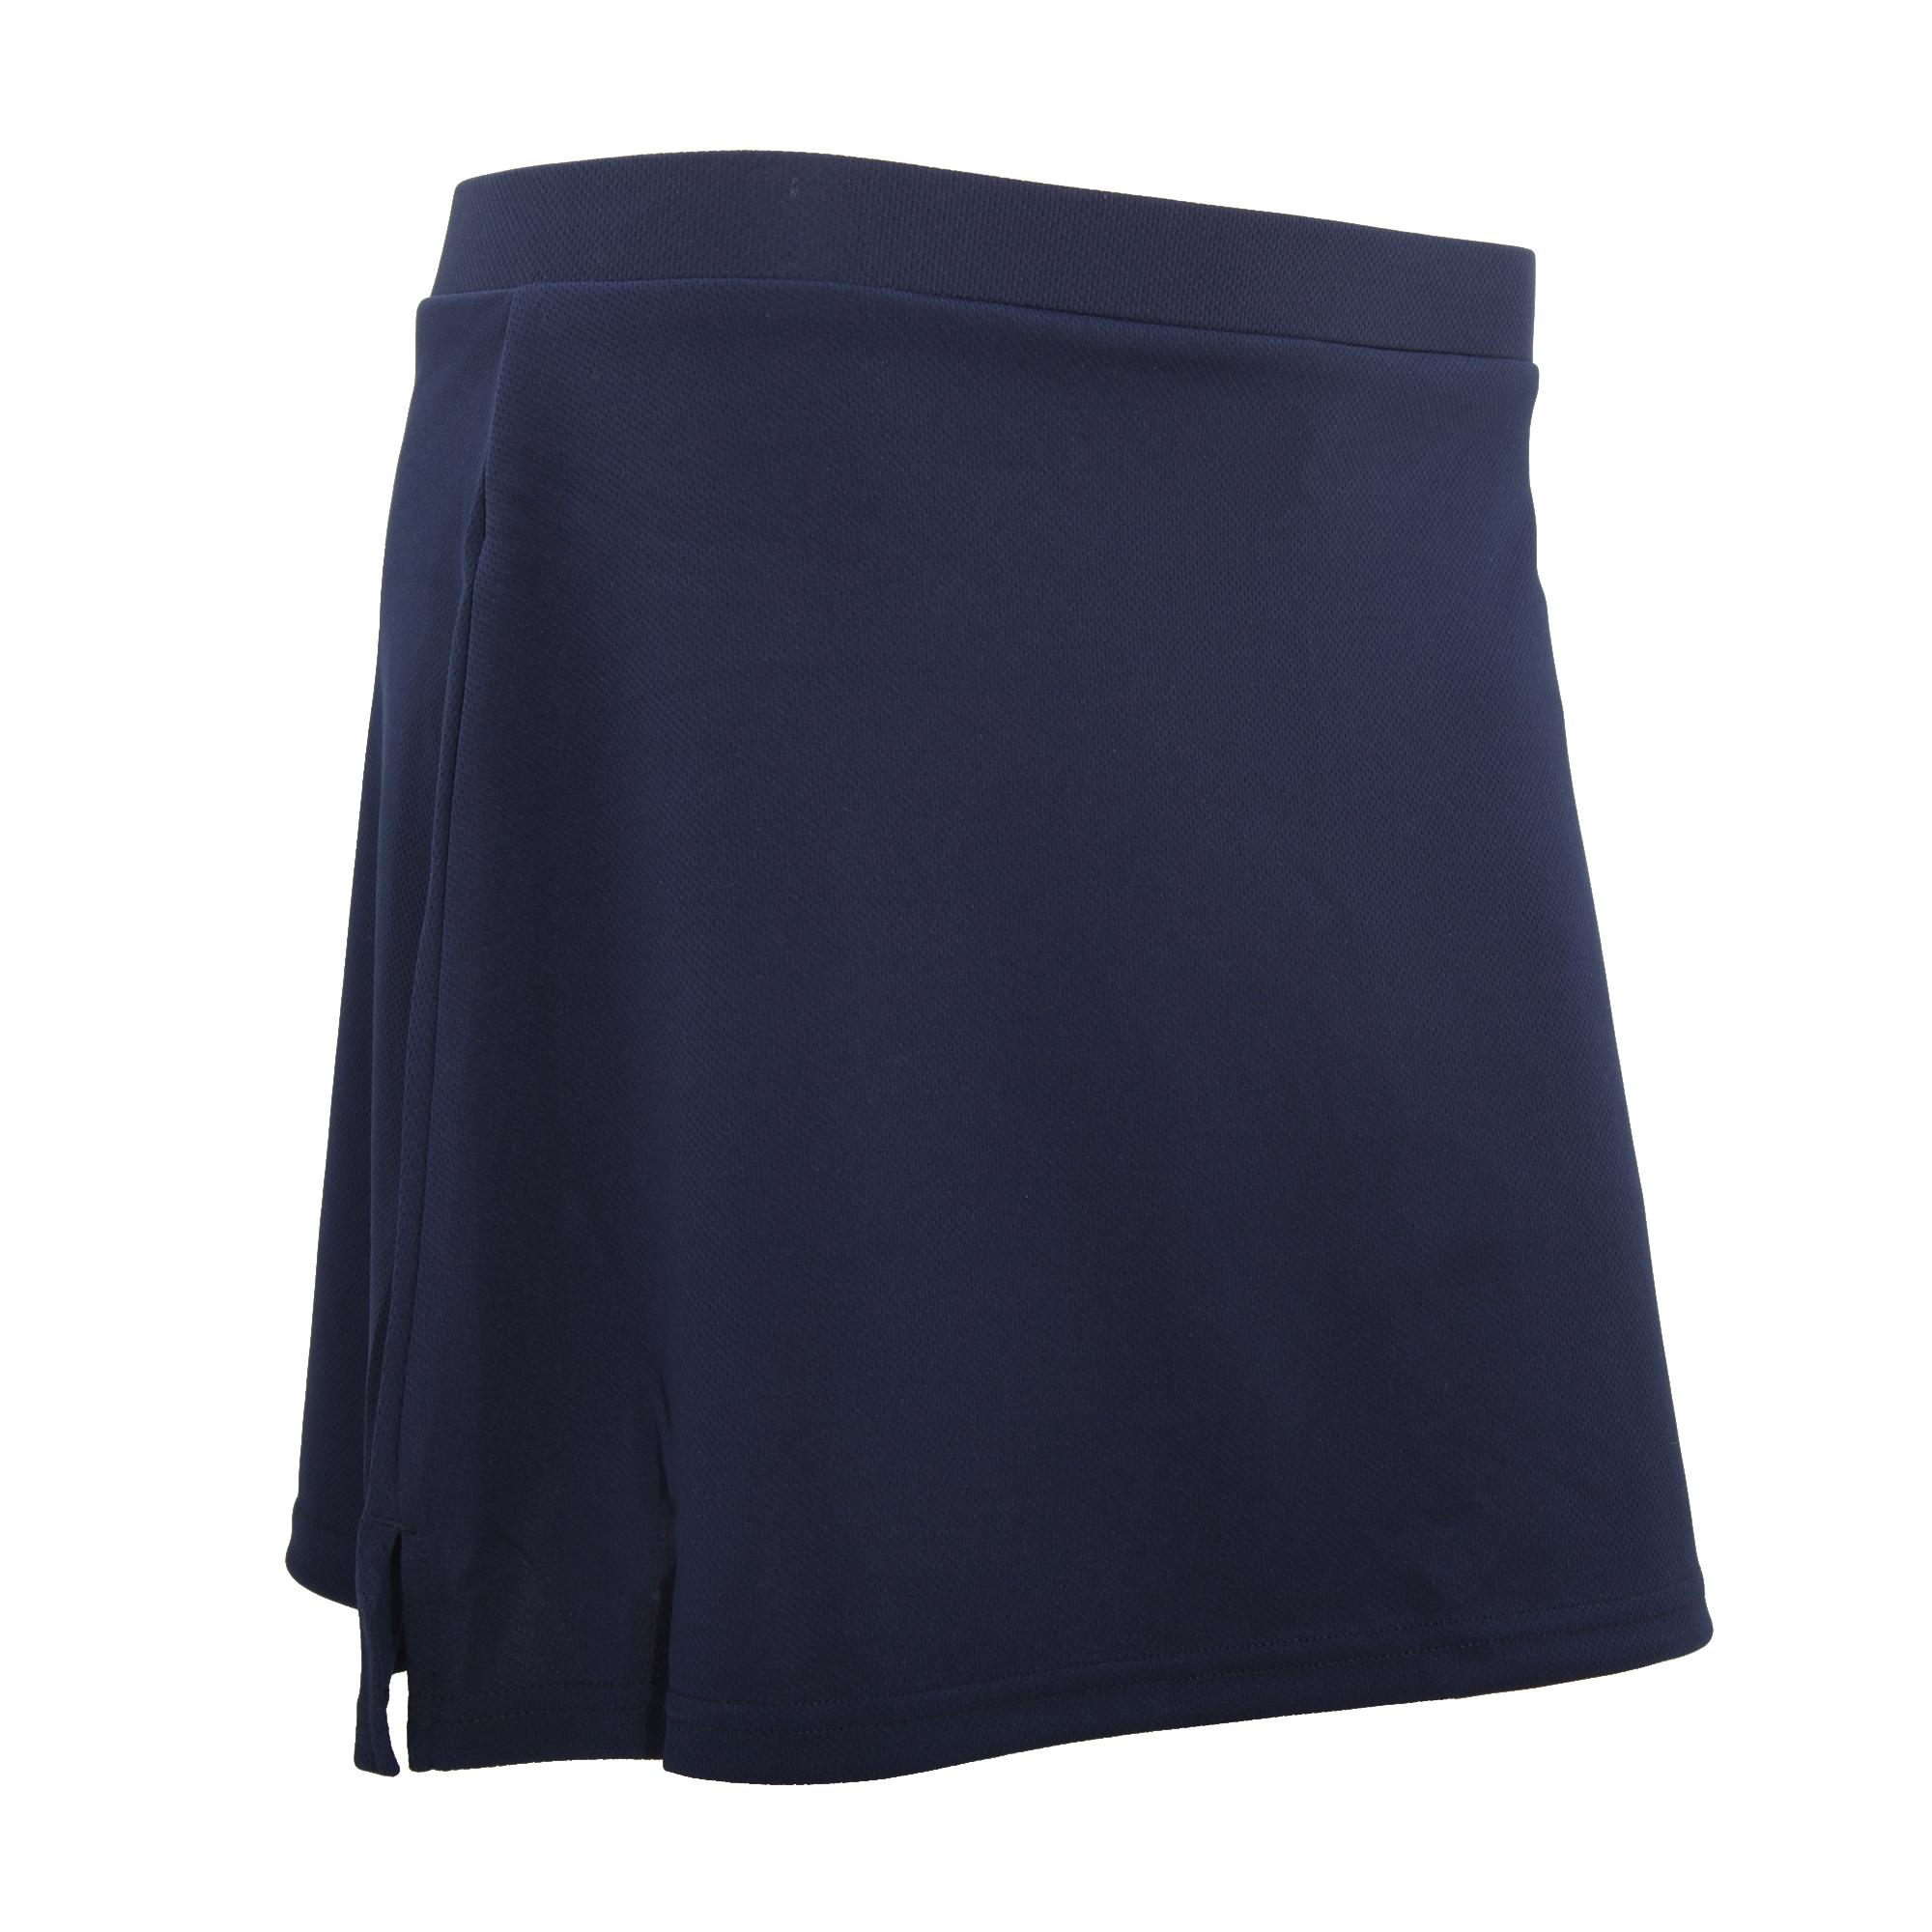 Spiro Ladies/Womens Windproof Quick Dry Sports Skort (XL) (Navy Blue)